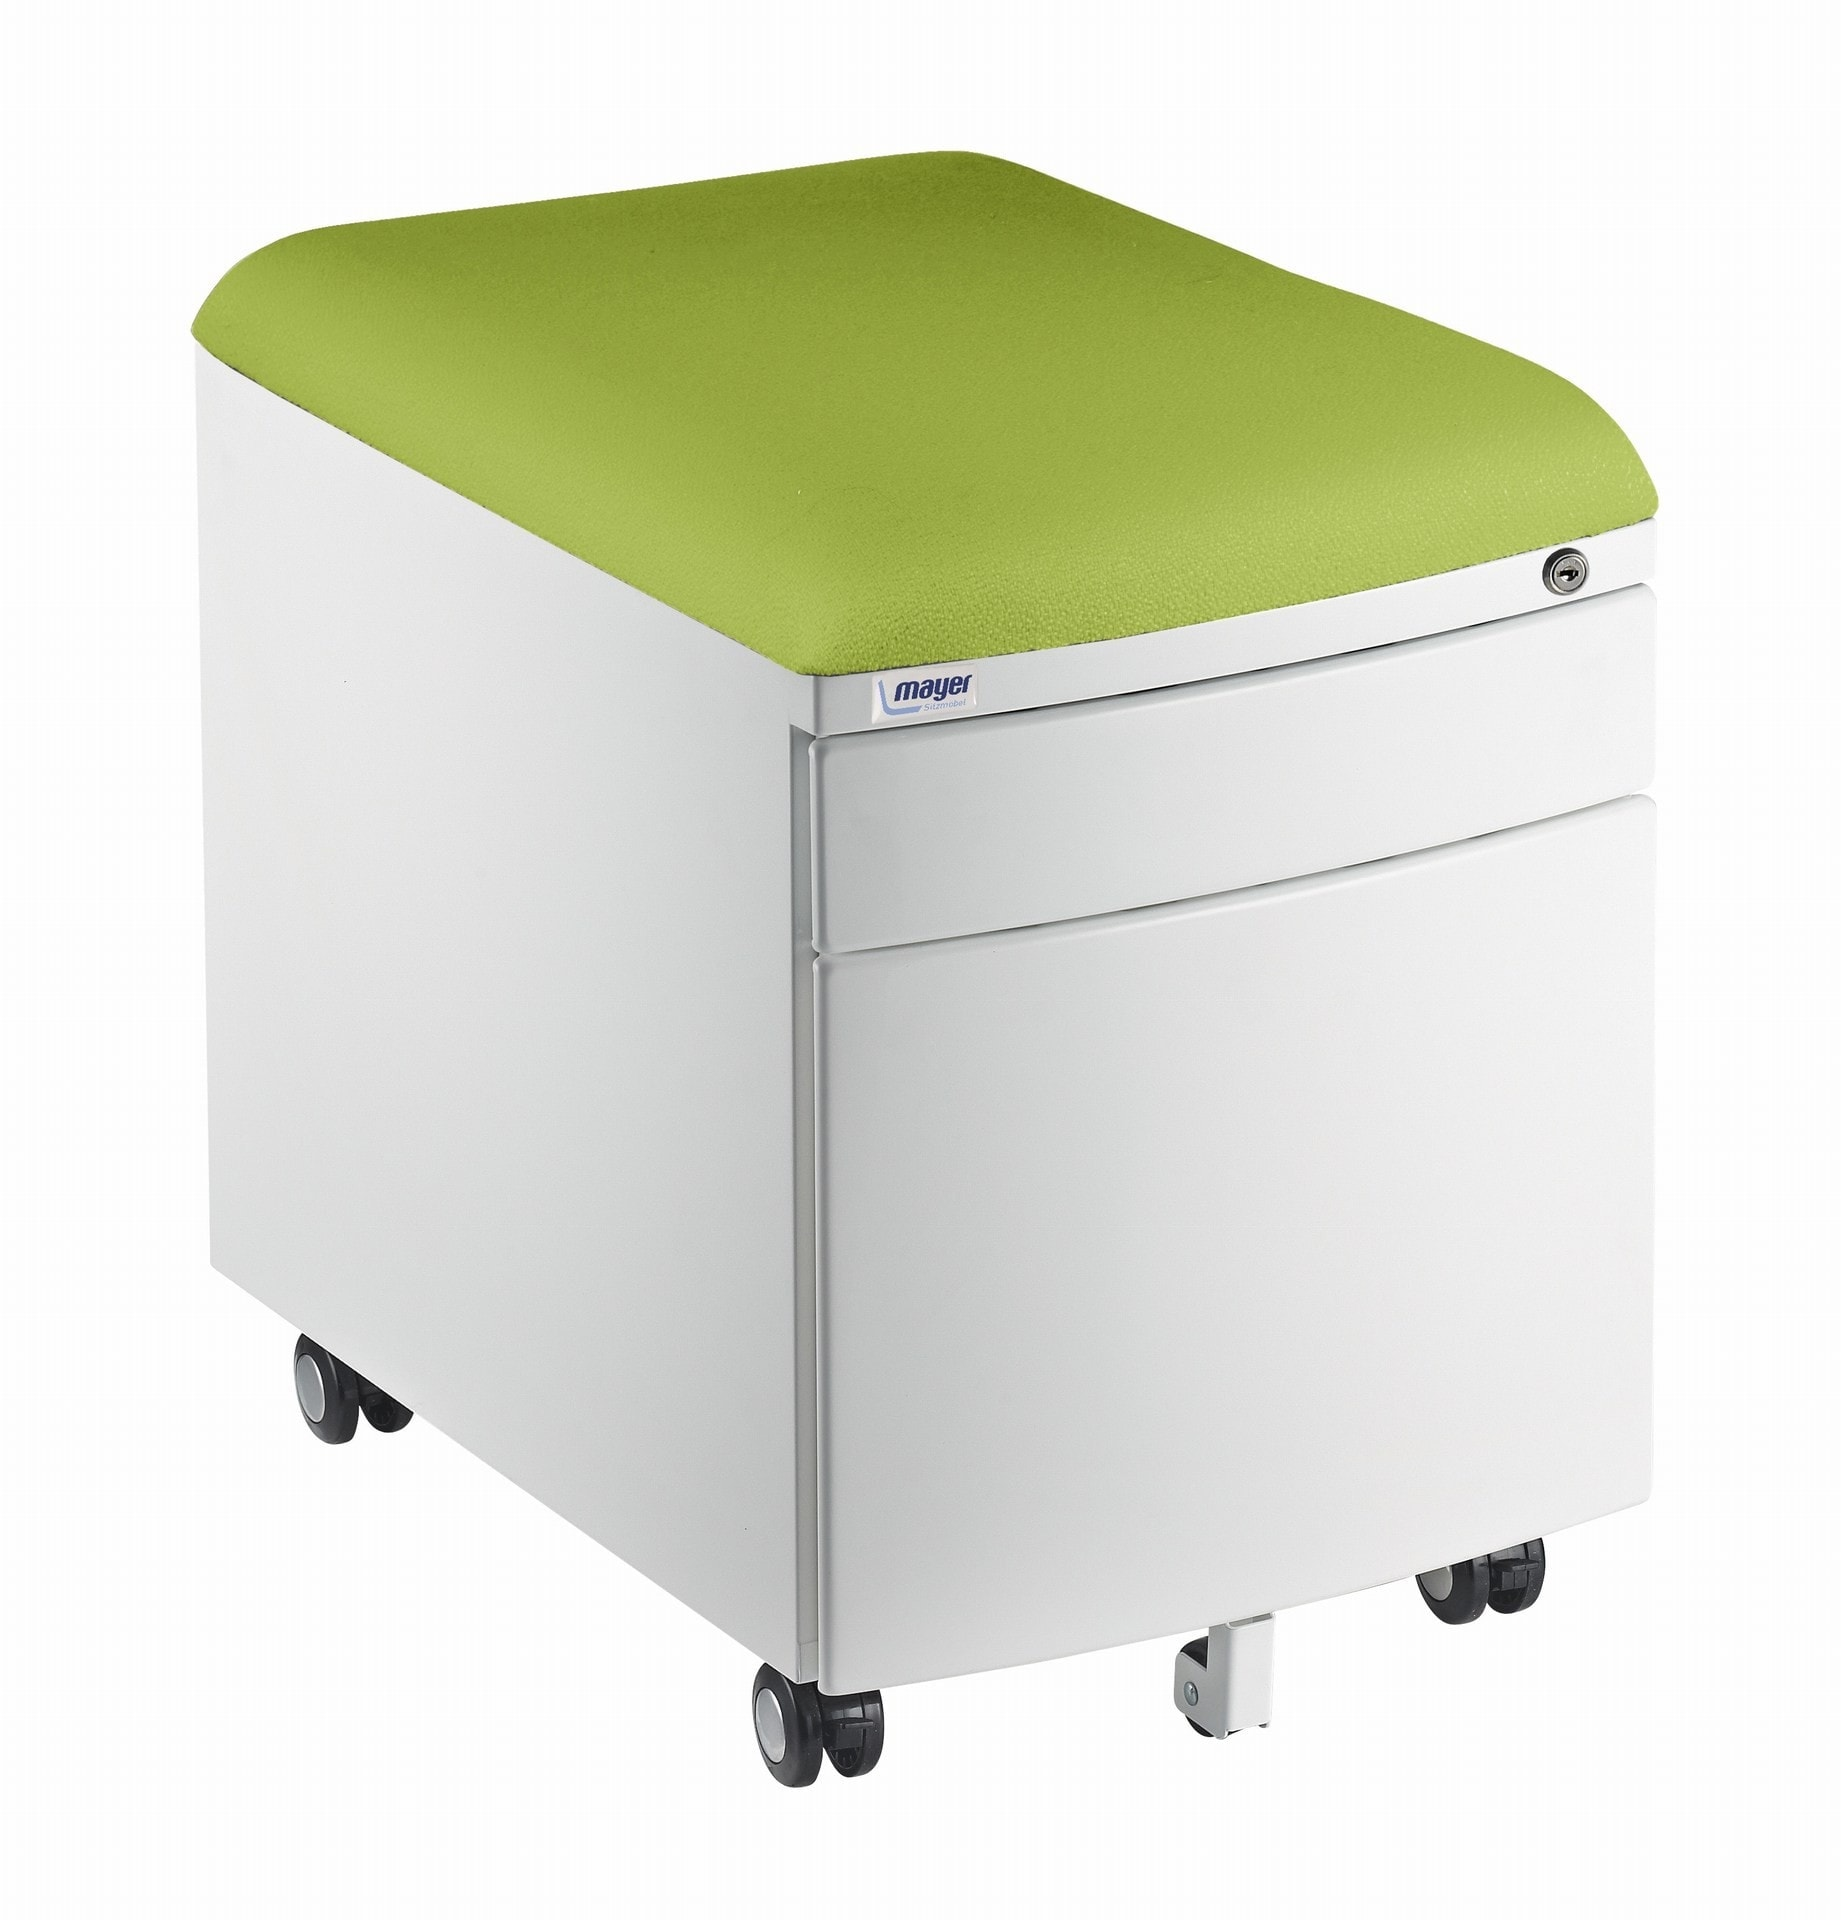 Kontejner Mayer bílý, potah zelený aquaclean